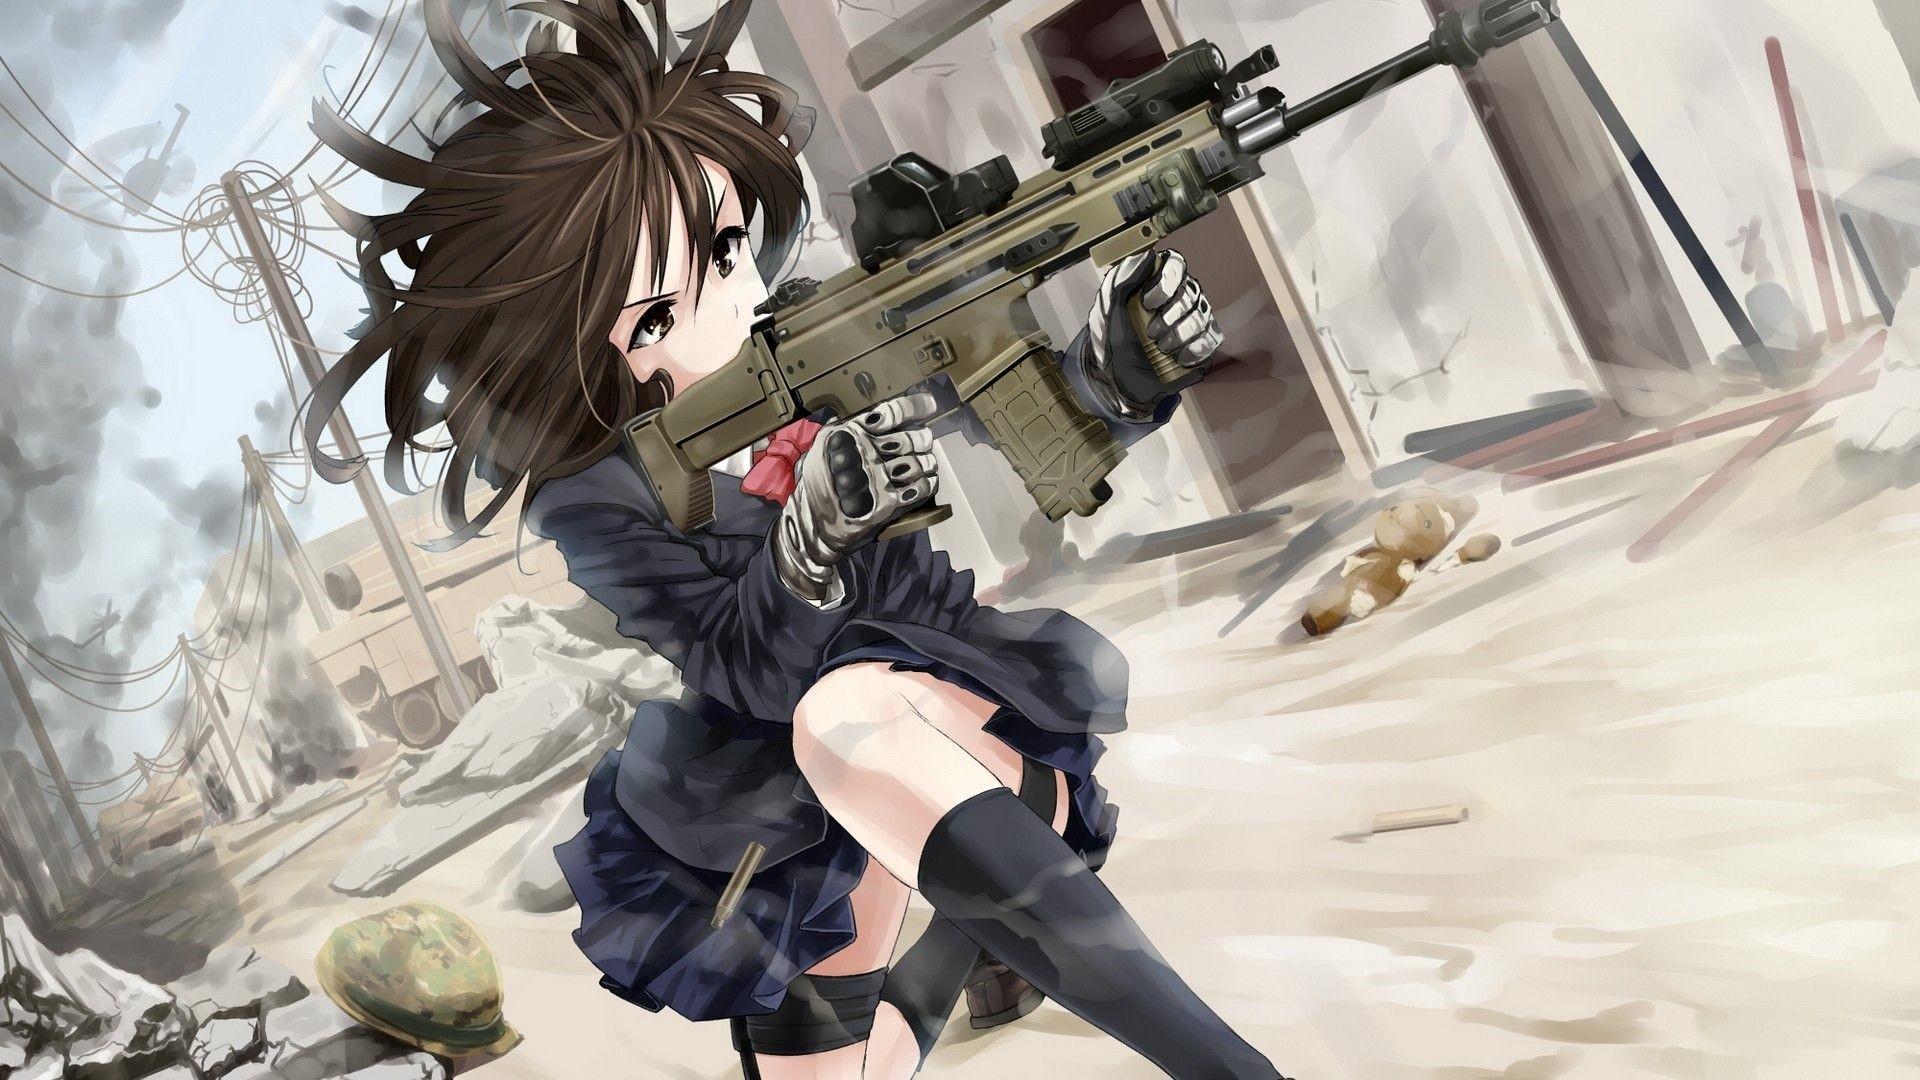 Anime Girls With Guns Wallpaper Desktop